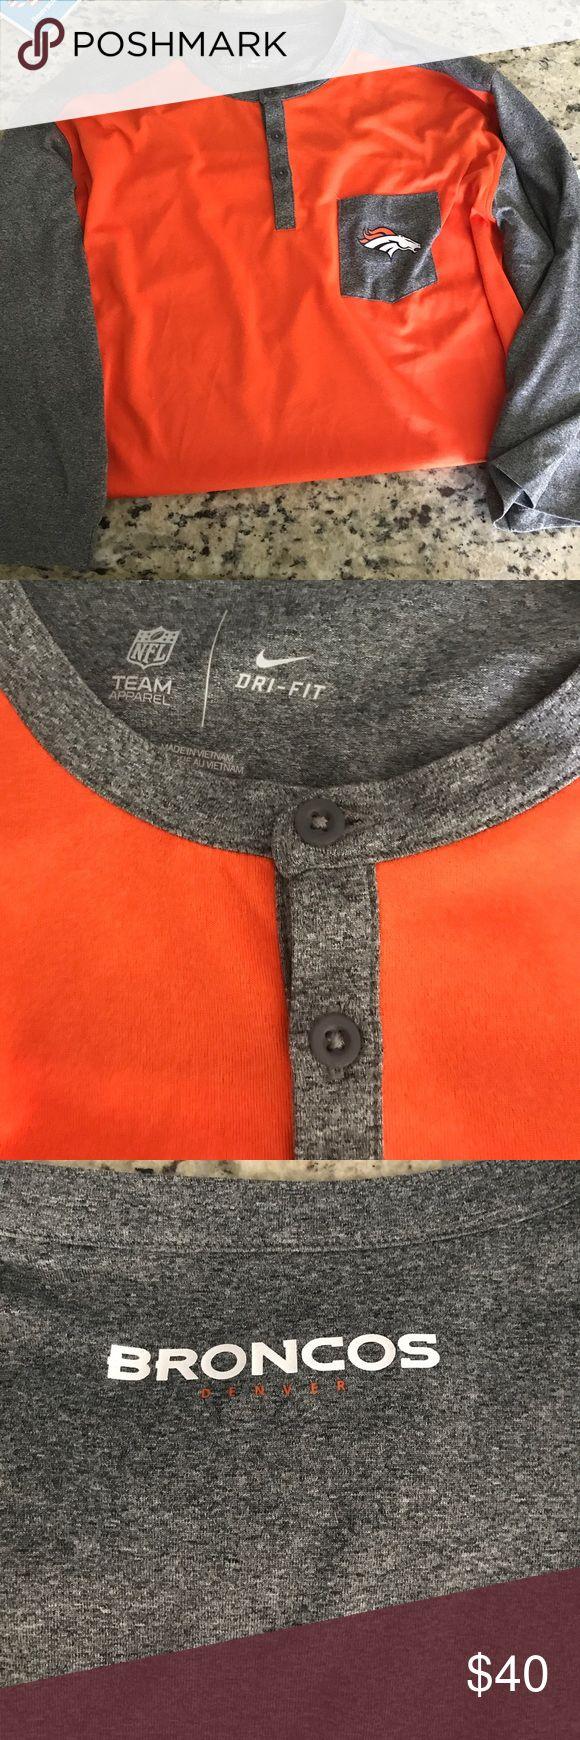 Nike Denver broncos shirt Brand new! Never worn. 3/4 sleeve. Paid $60 for the shirt. Smoke free home. Nike Shirts Tees - Long Sleeve